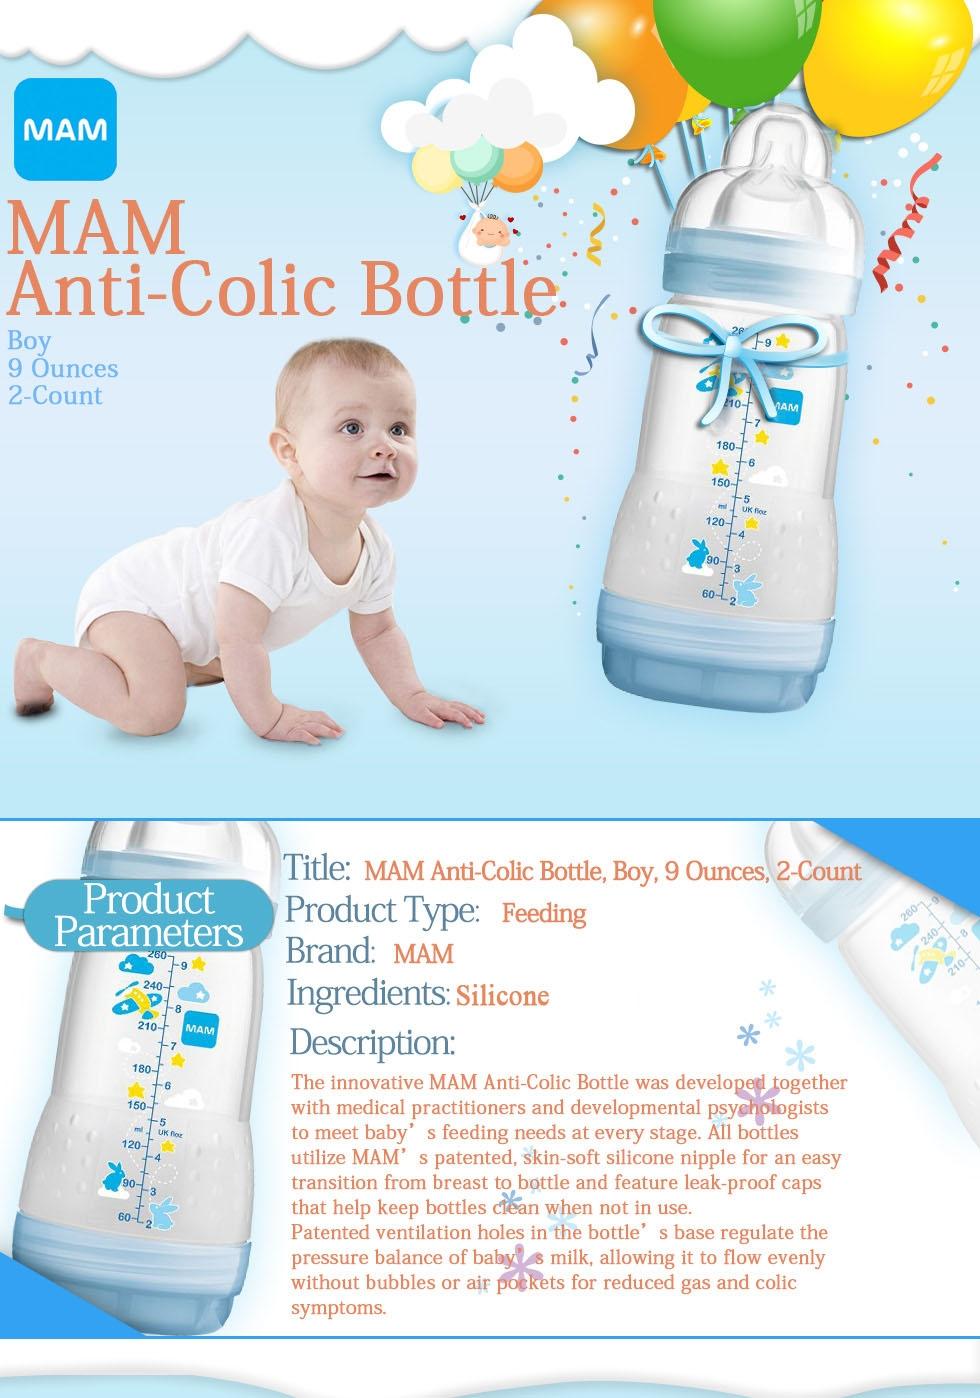 Mam Anti Colic Bottle Boy 9 Oz 2 Count Savefavor Buy 1 Get Free Blue Image